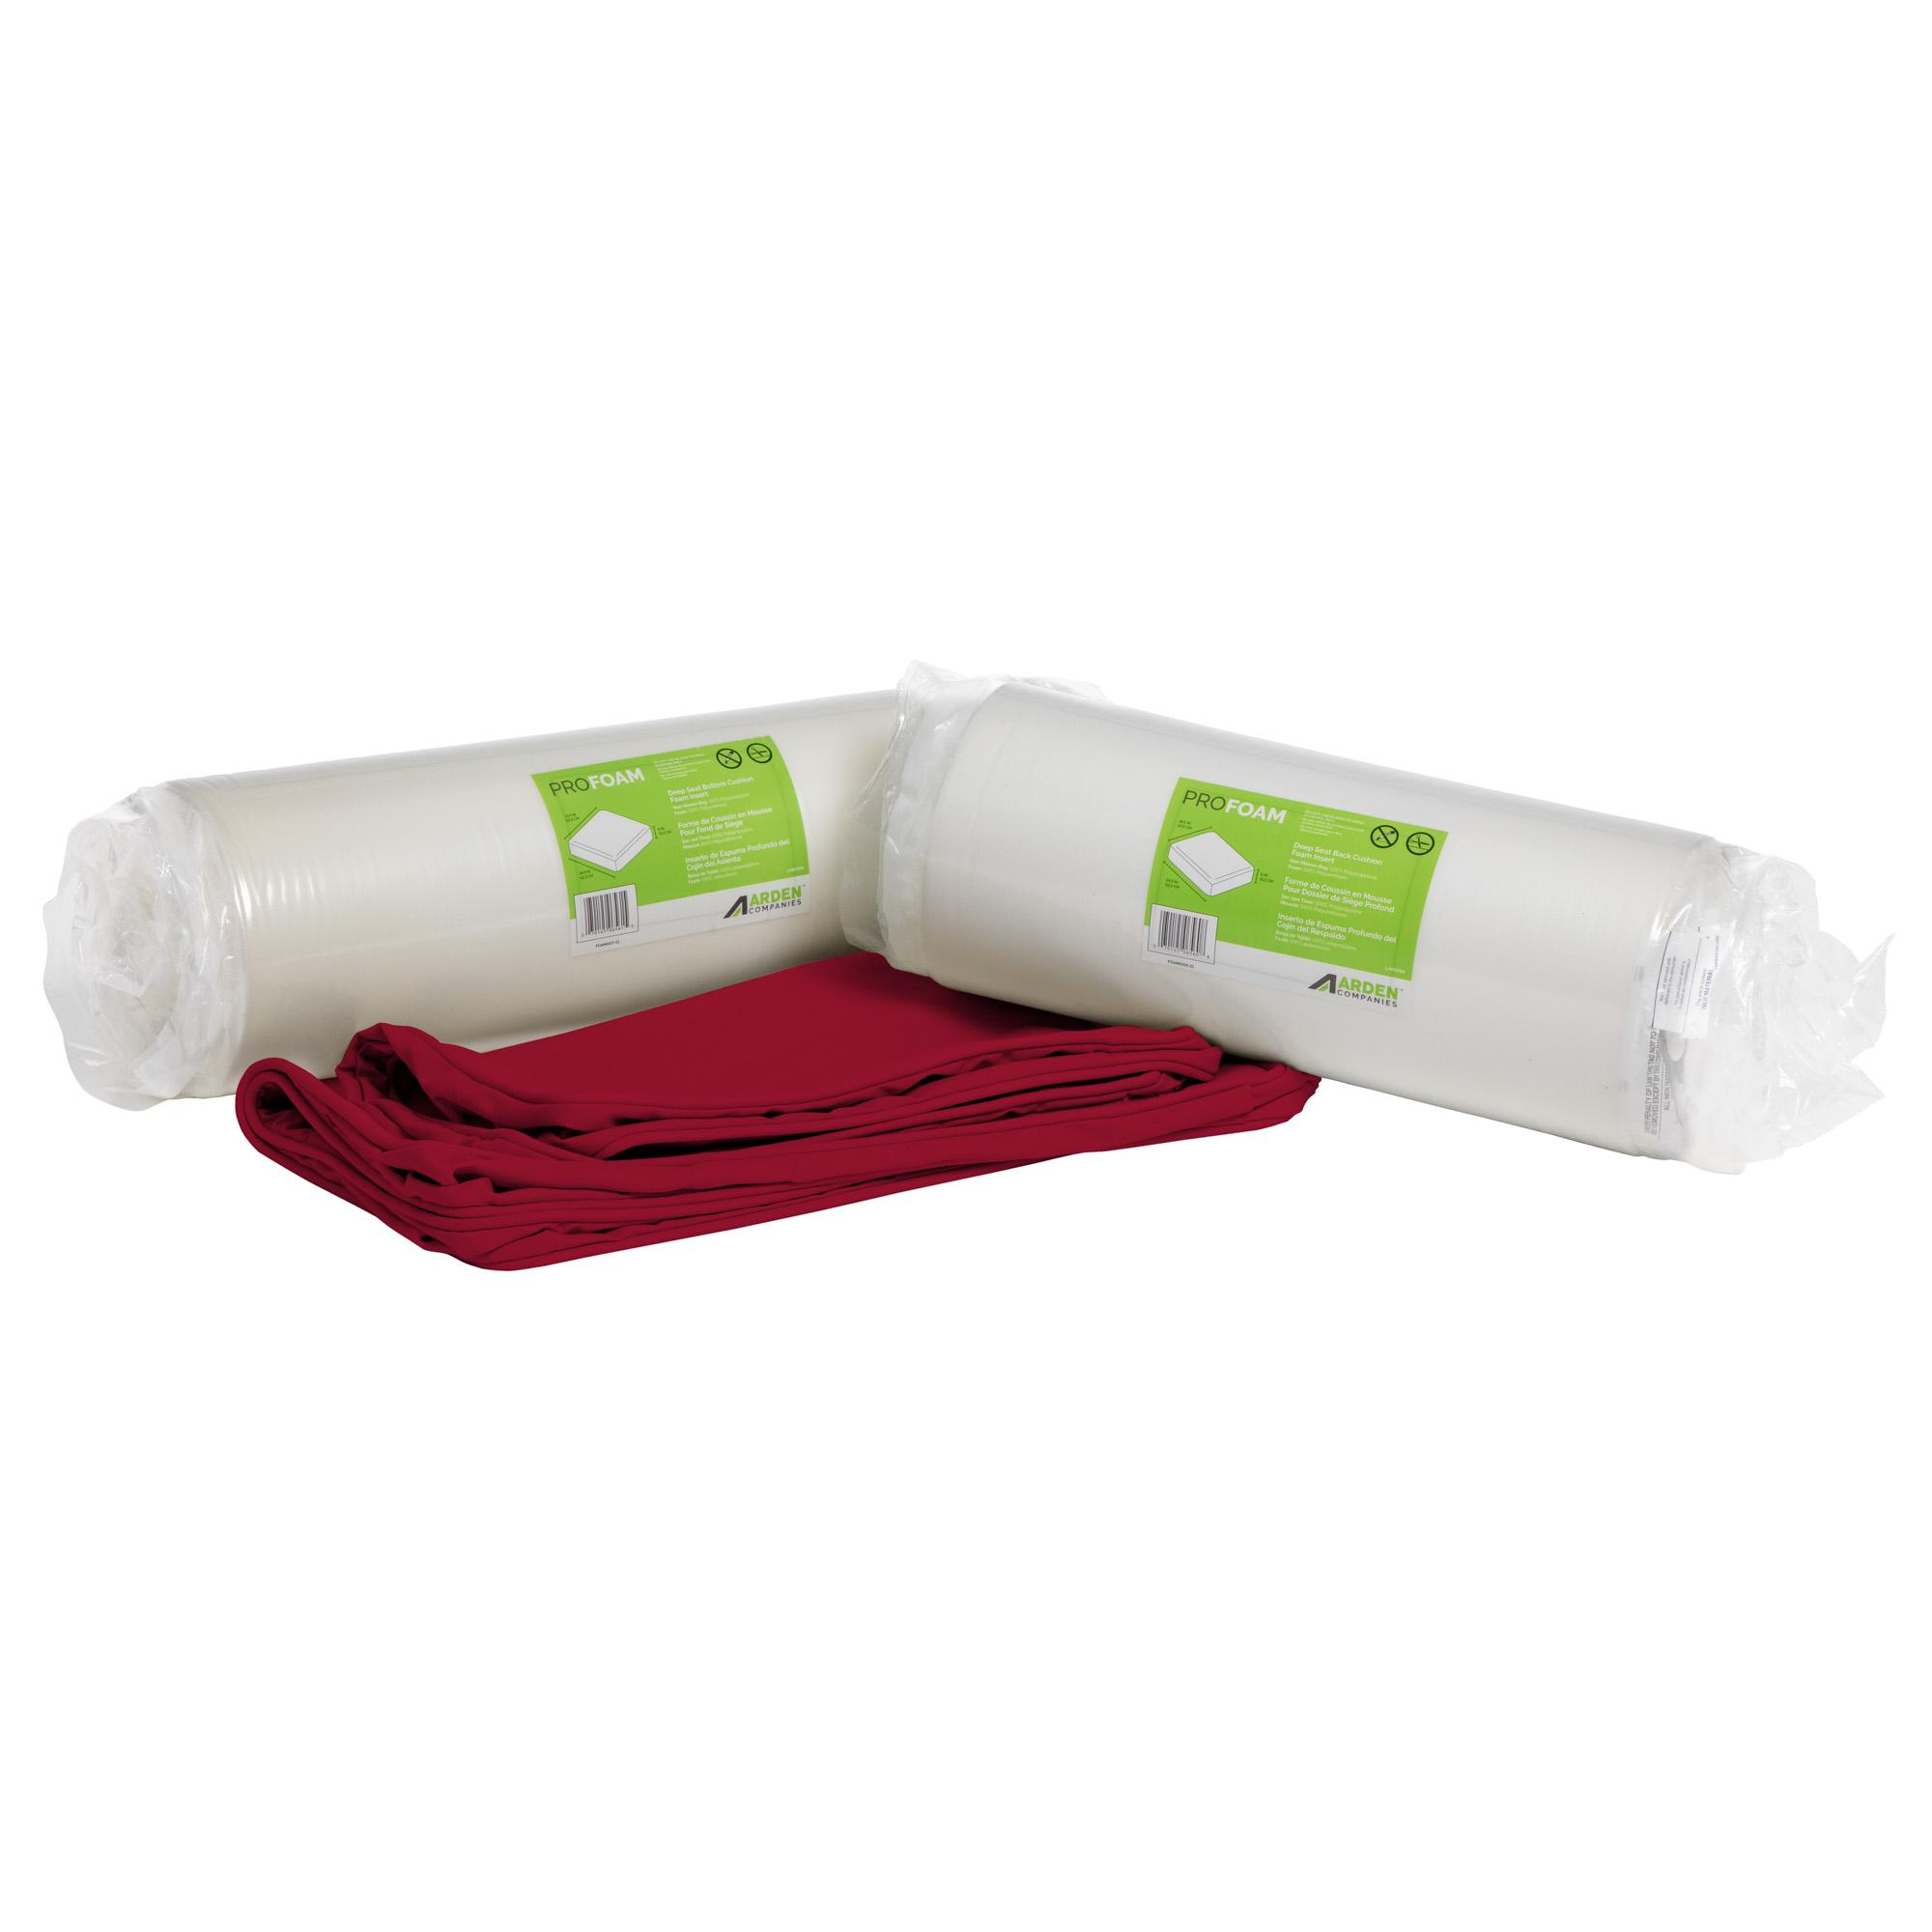 Arden Selections Profoam 42 X 24 In Acrylic Deep Seat Cushion Set Walmart Com Walmart Com